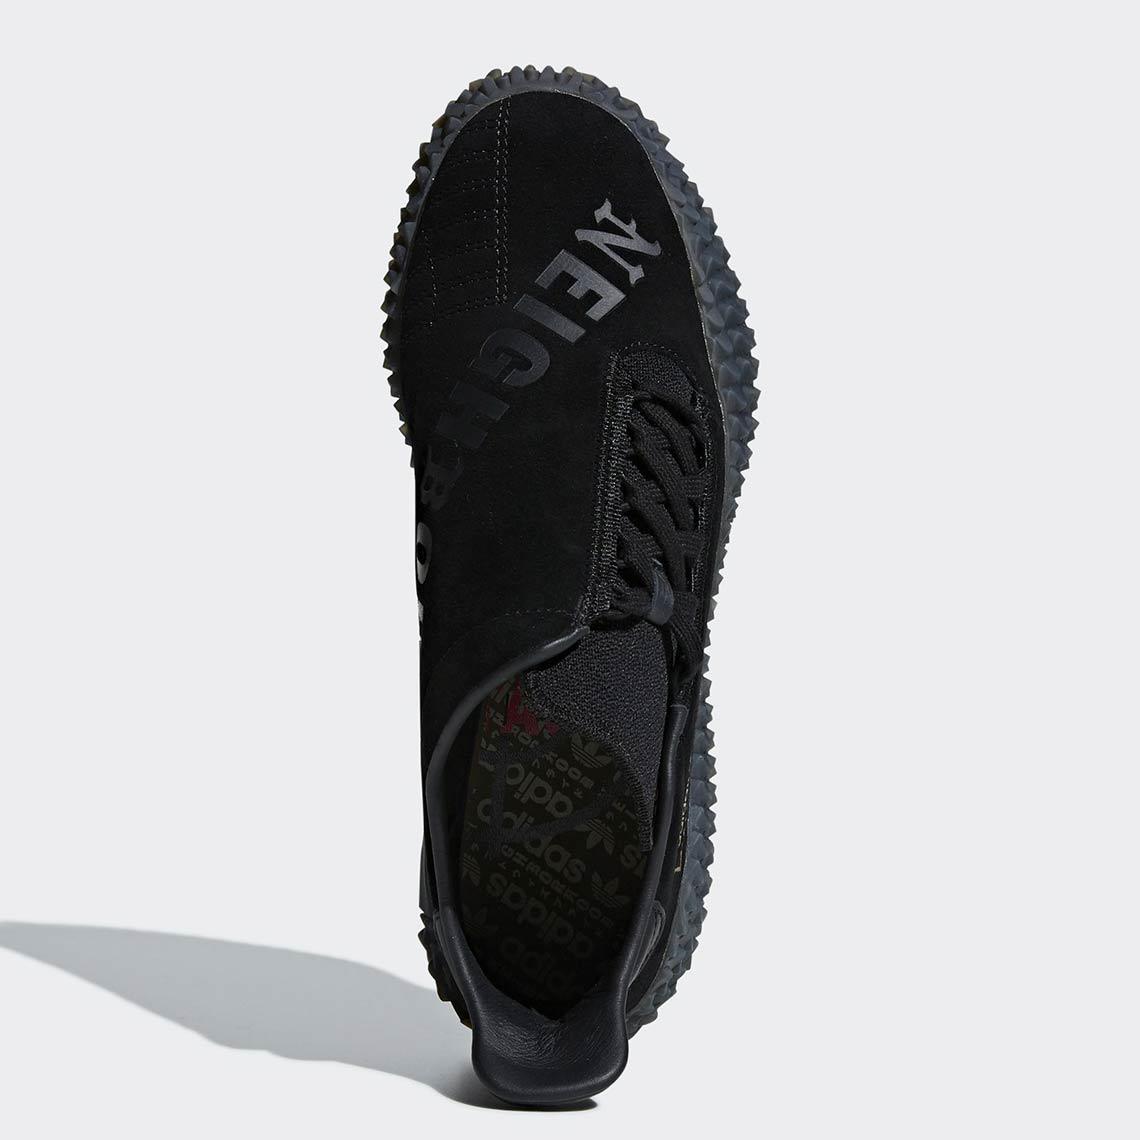 3509266fe0df4 NEIGHBORHOOD x adidas Stan Smith Boost Release Date  September 1